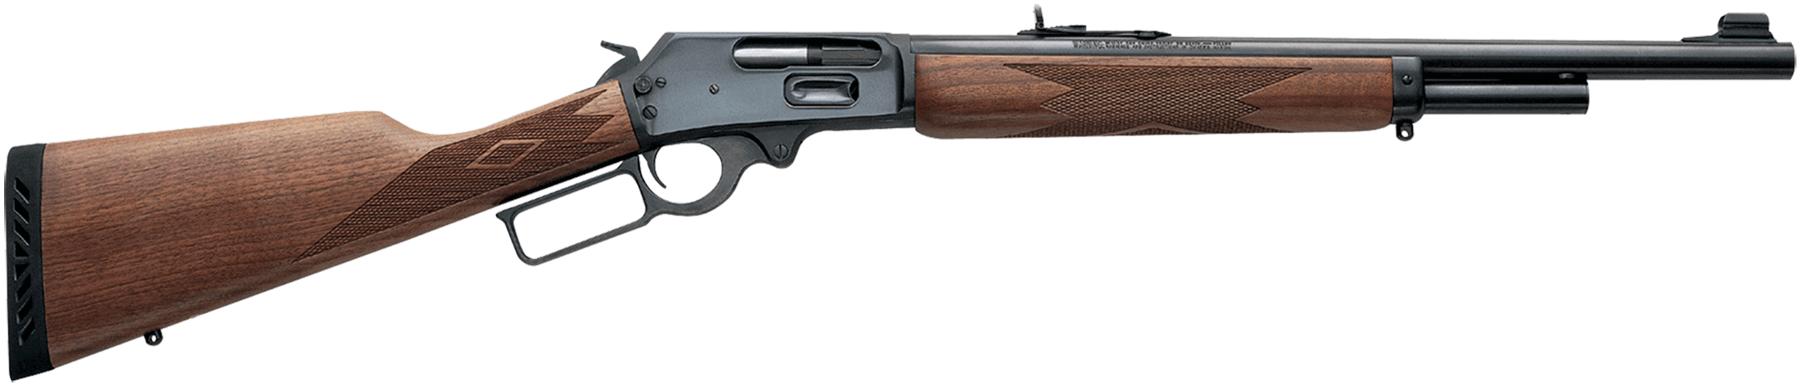 marlin model 1895 guide gun